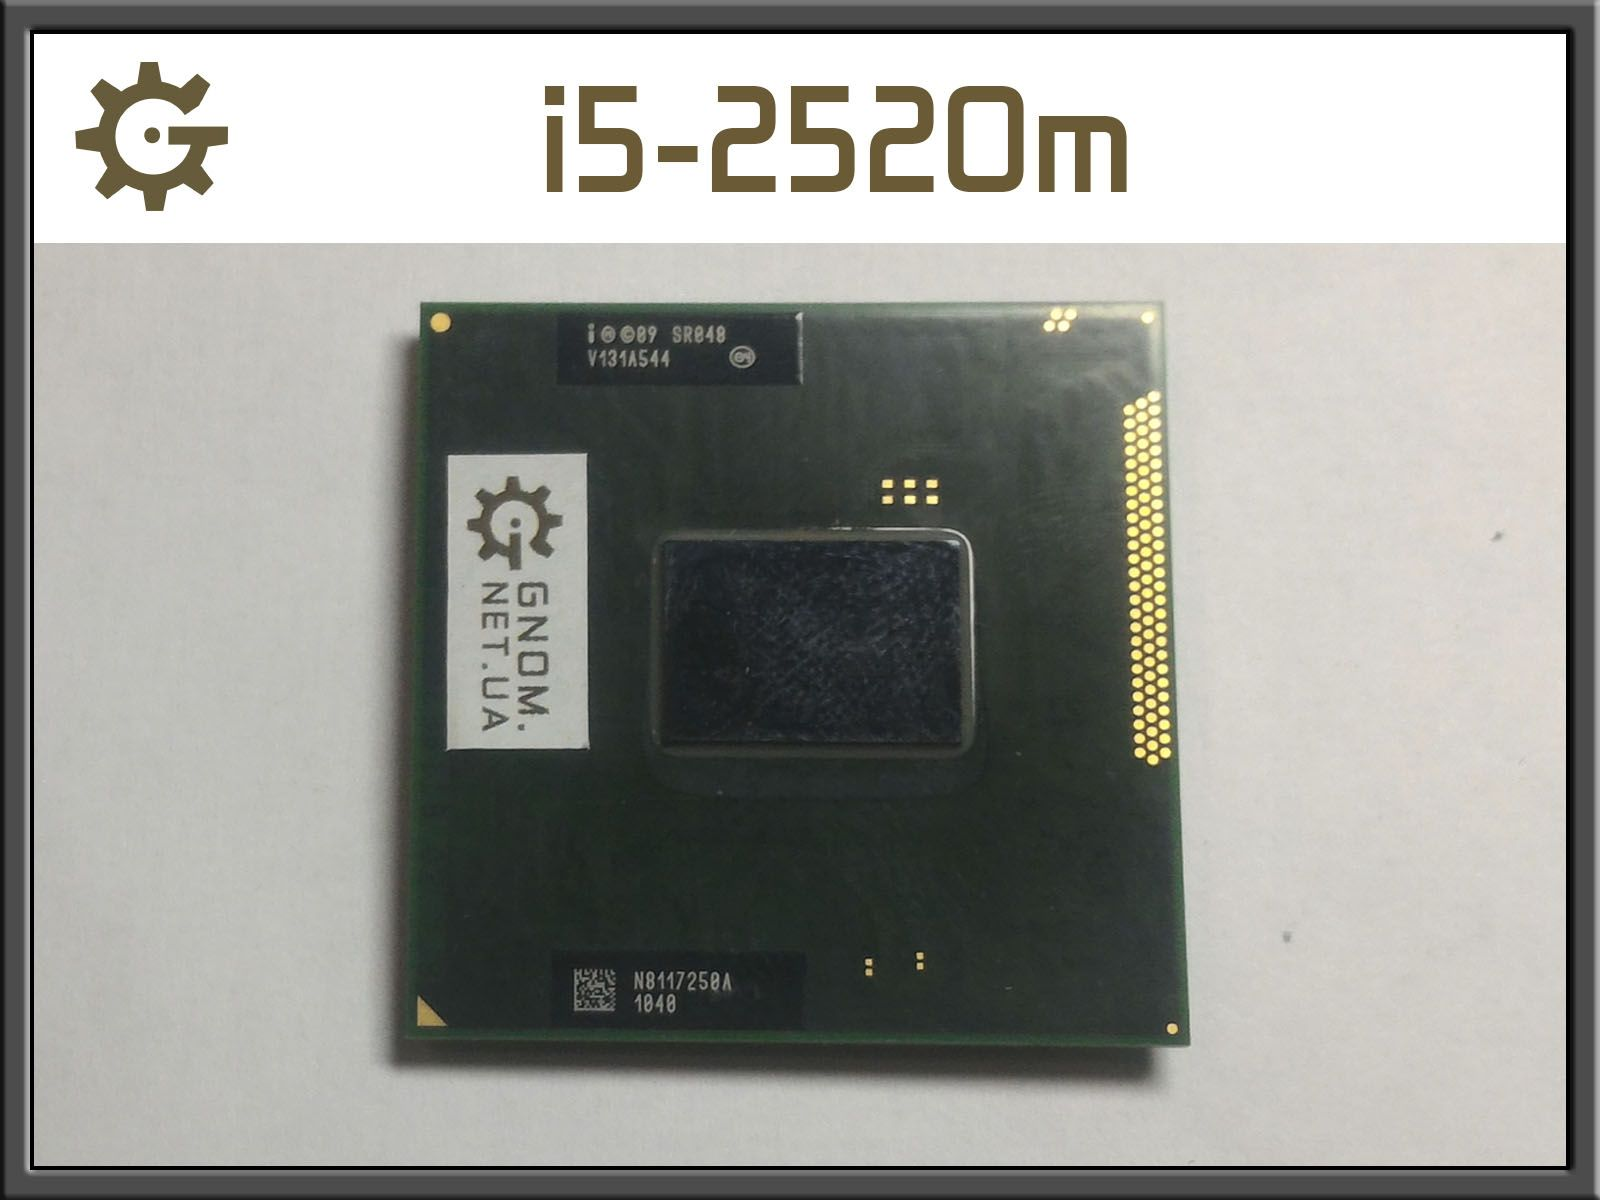 Процессор Intel Core i5-2520m ноутбук 2,5-3,2 Ghz Socket G2 SR048 +т/п